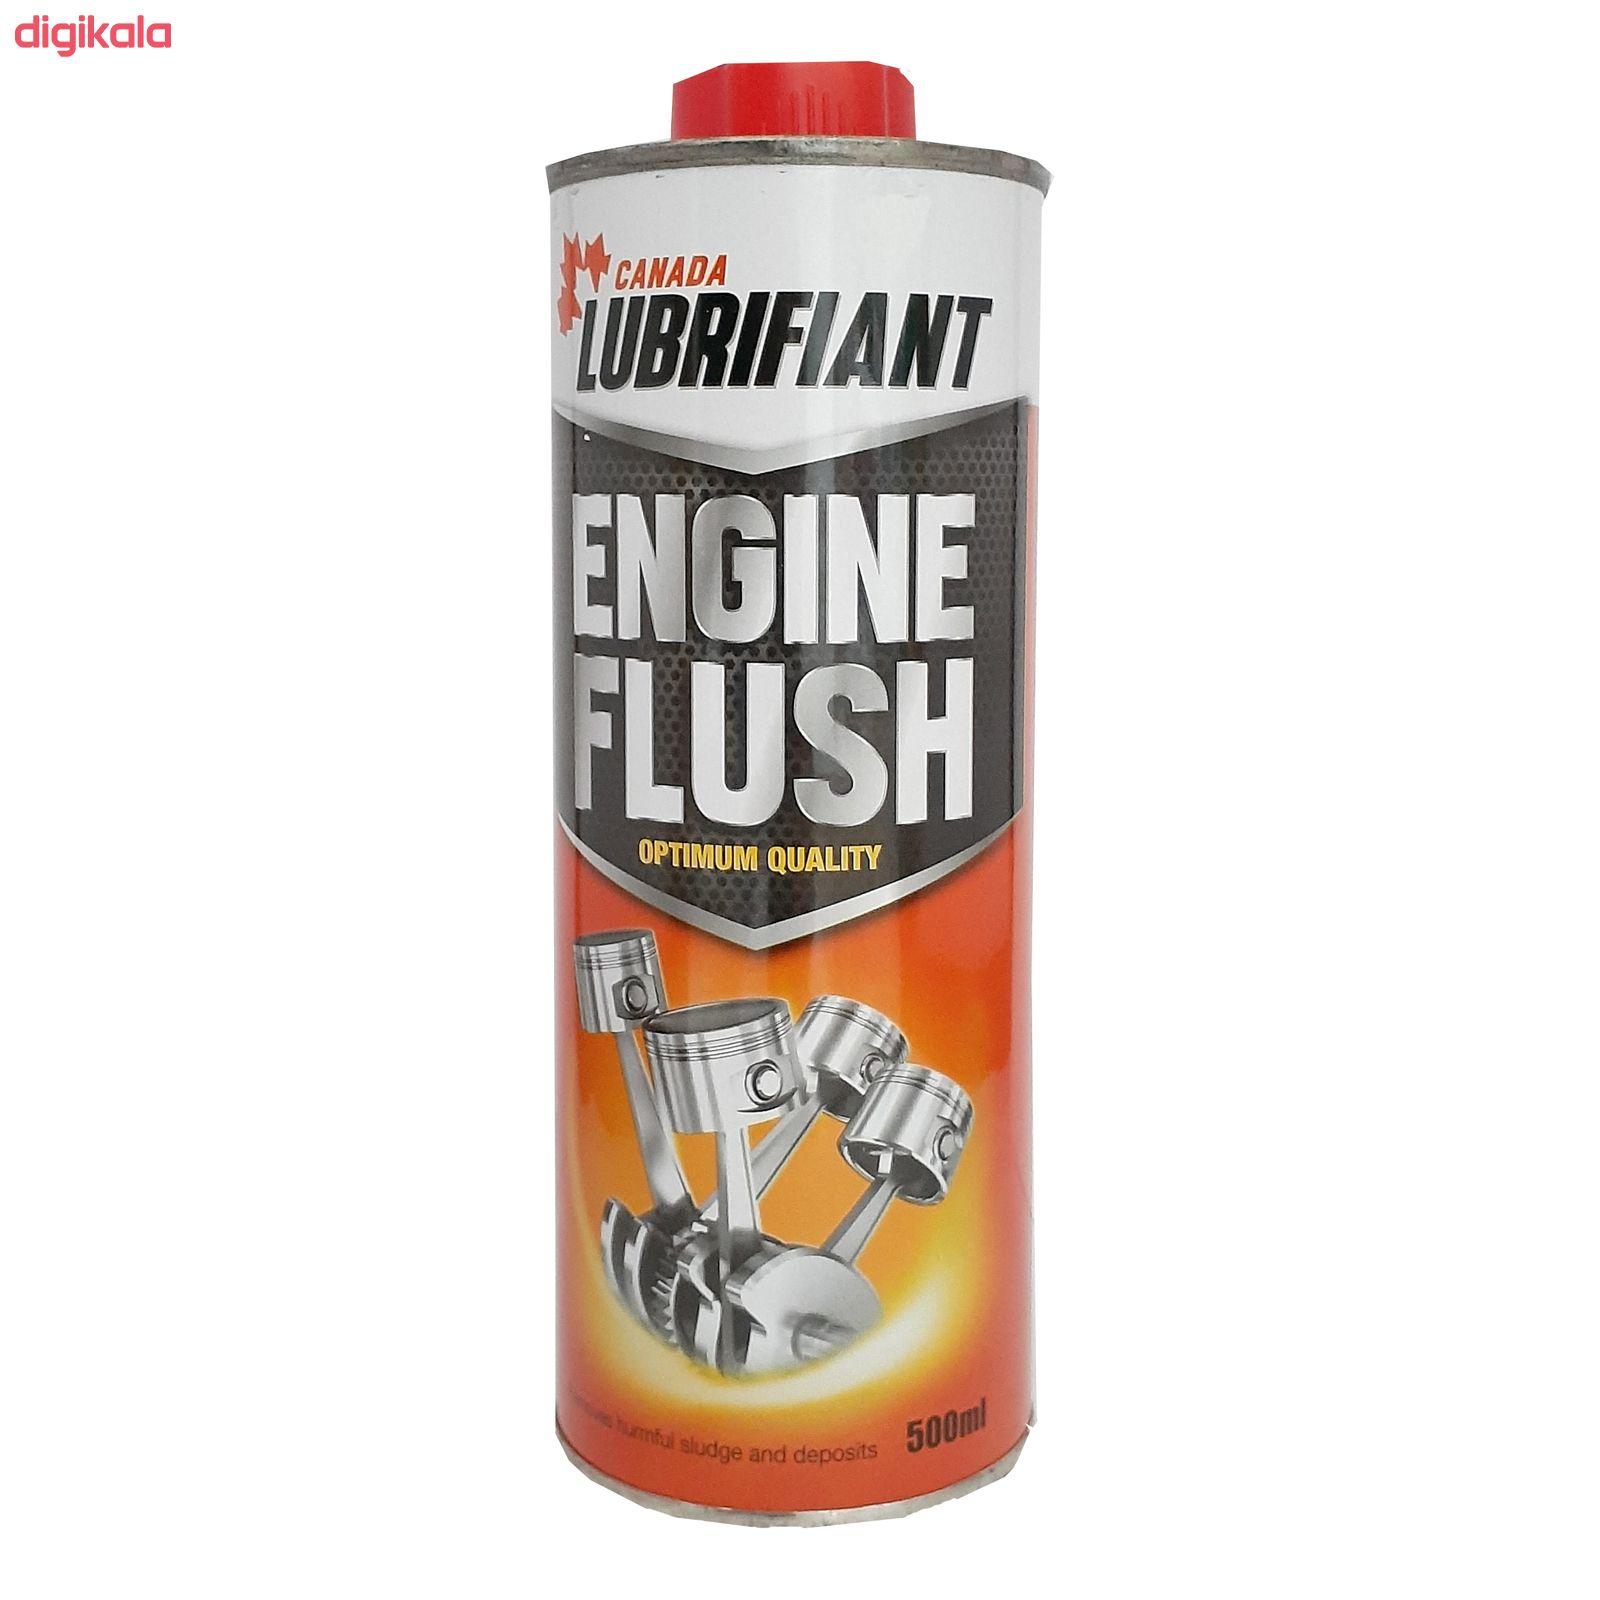 محلول موتور شوی کانادا لوبریفنت مدل Engine Flush حجم 500 میلی لیتر main 1 1